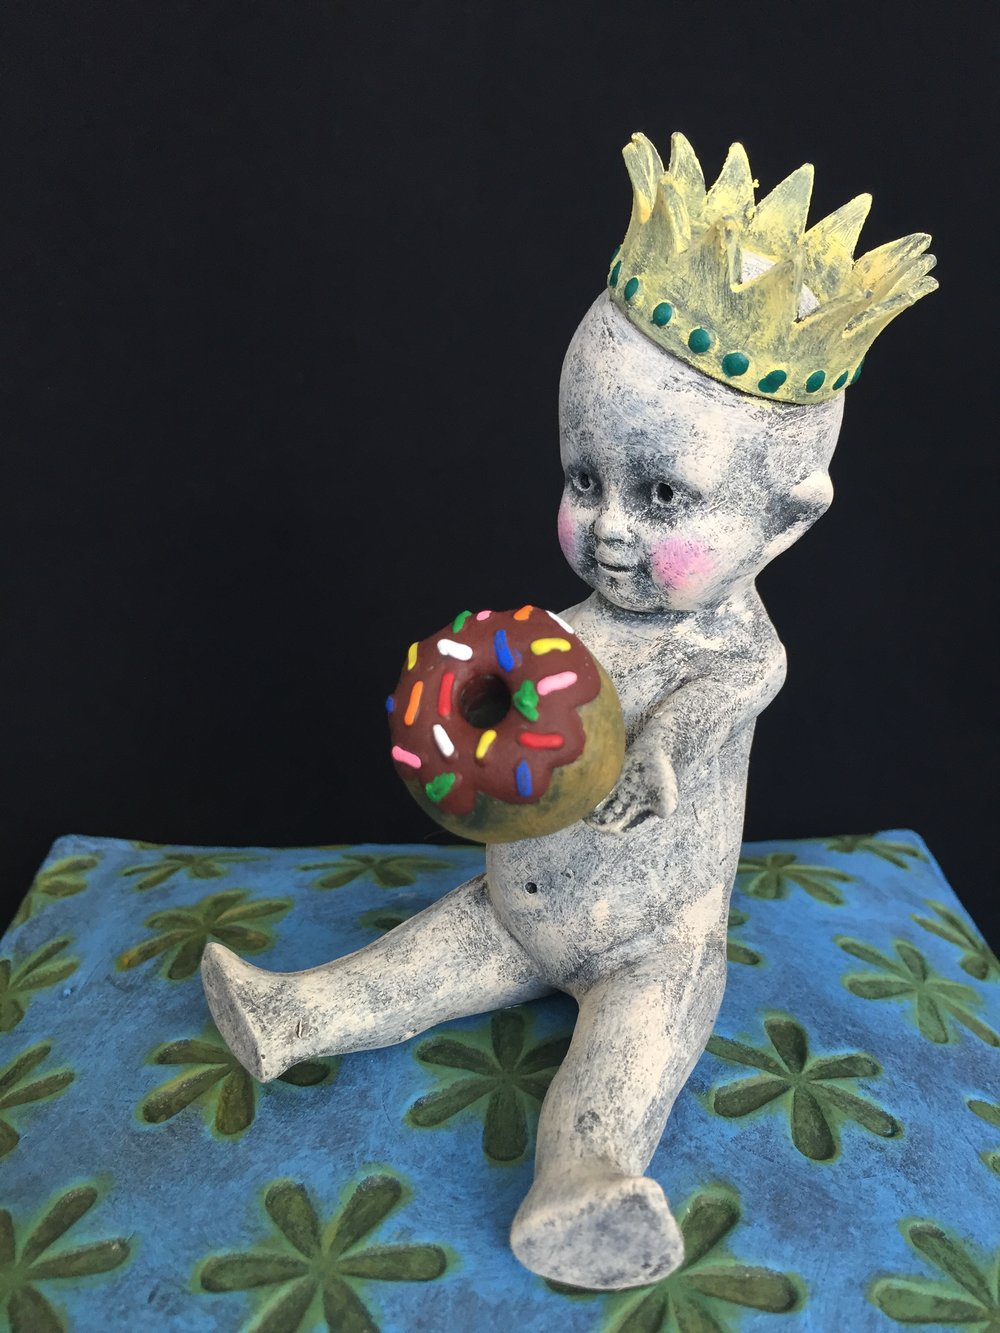 King Doughnut